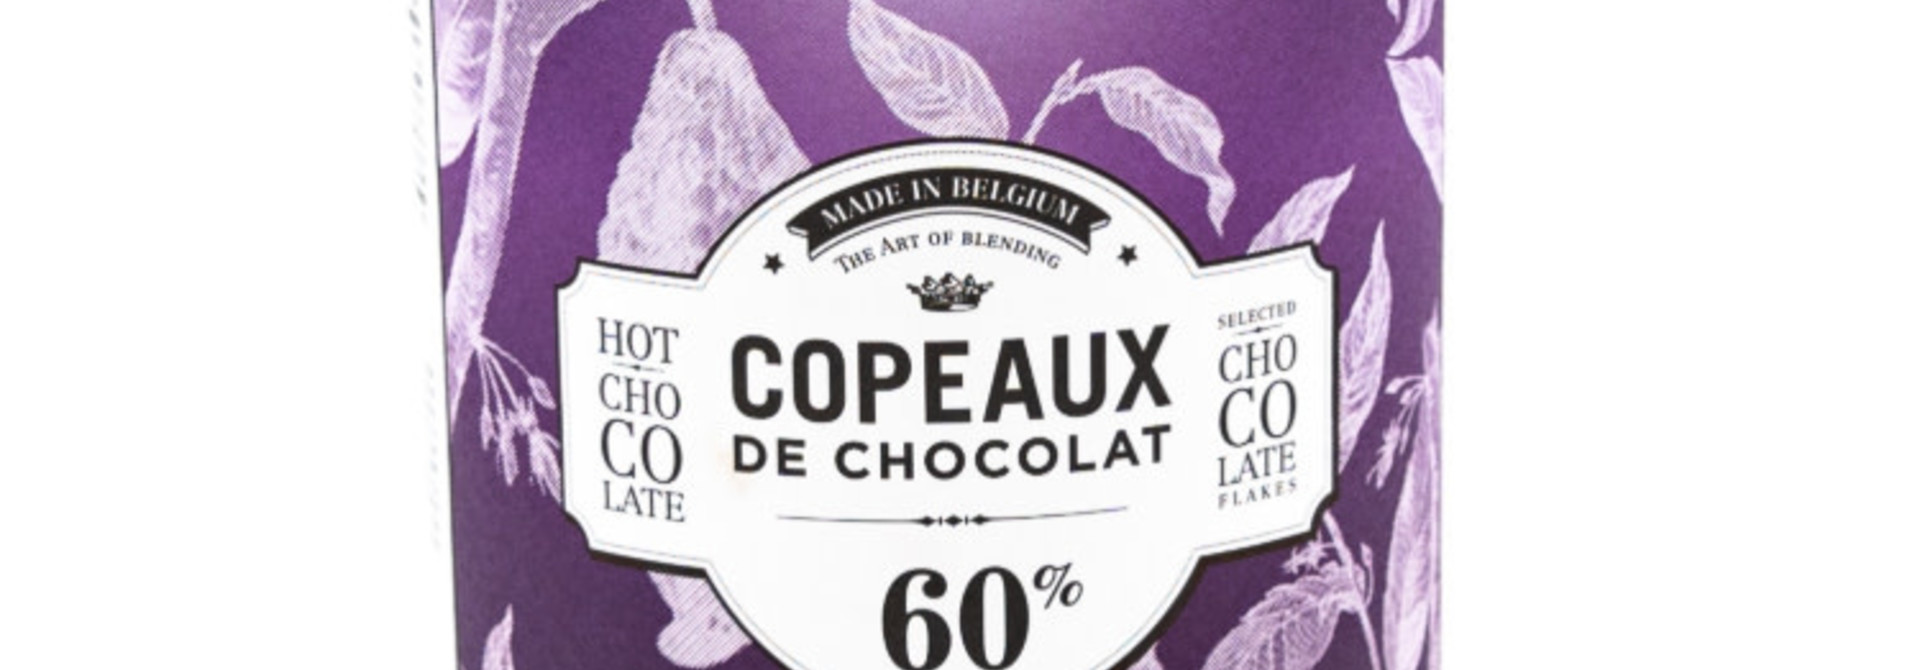 Dolfin box 350g dark chocolate flakes 60% cocoa